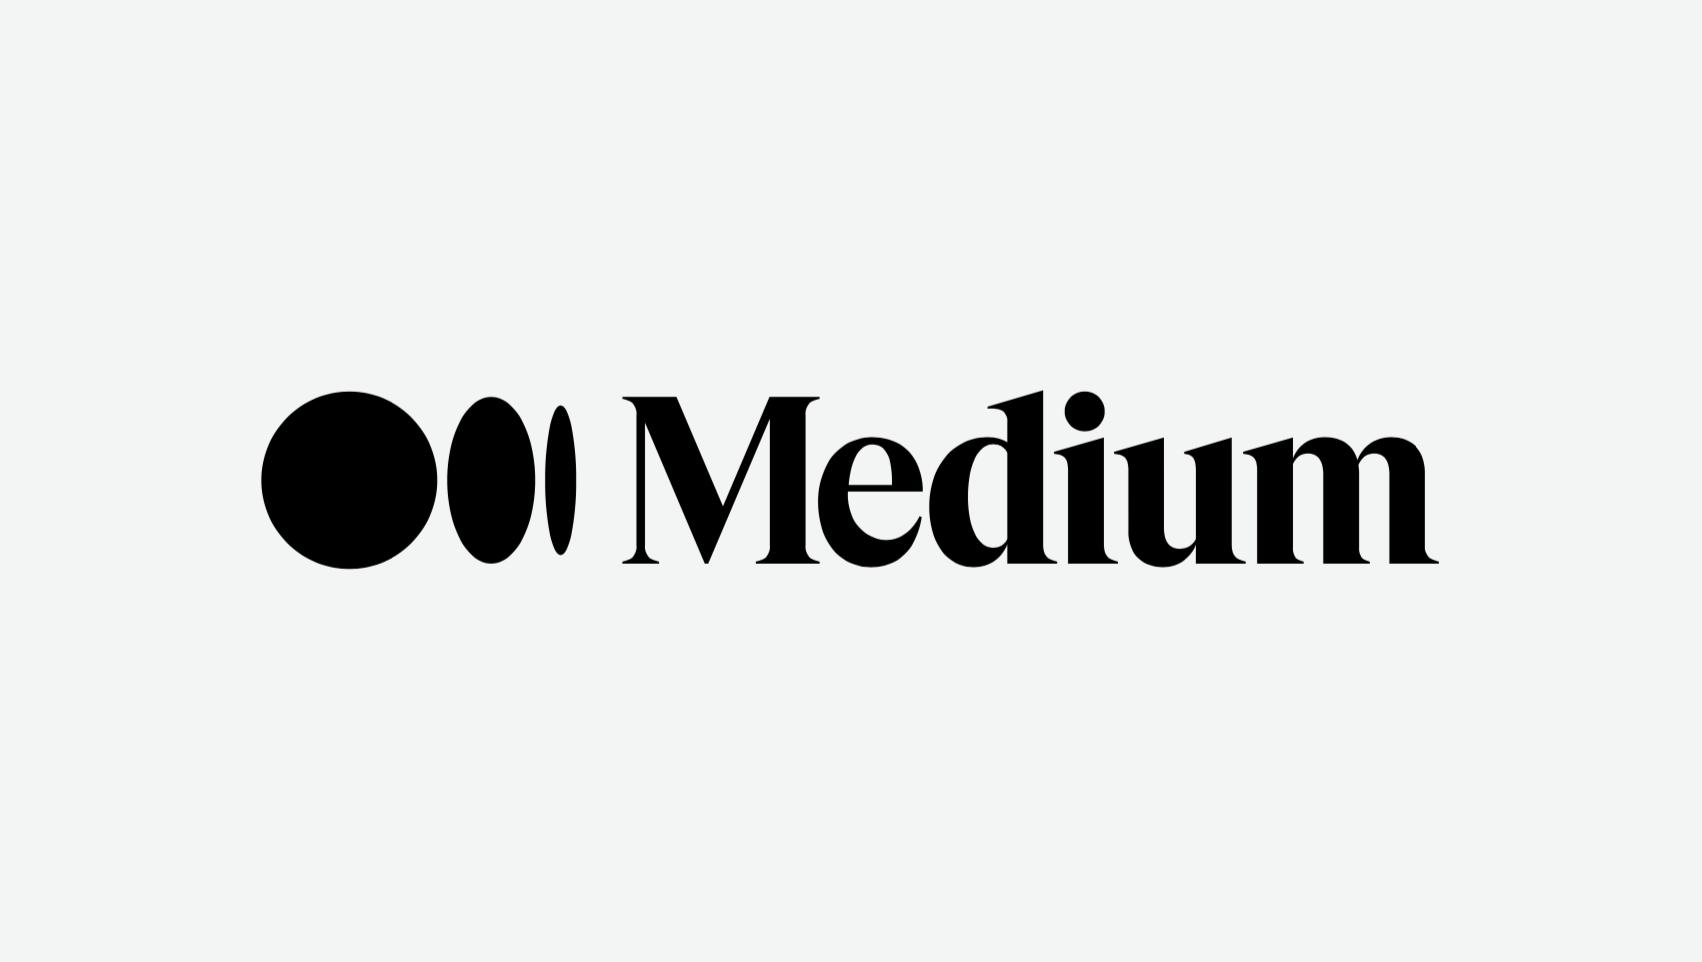 dhadmann medium